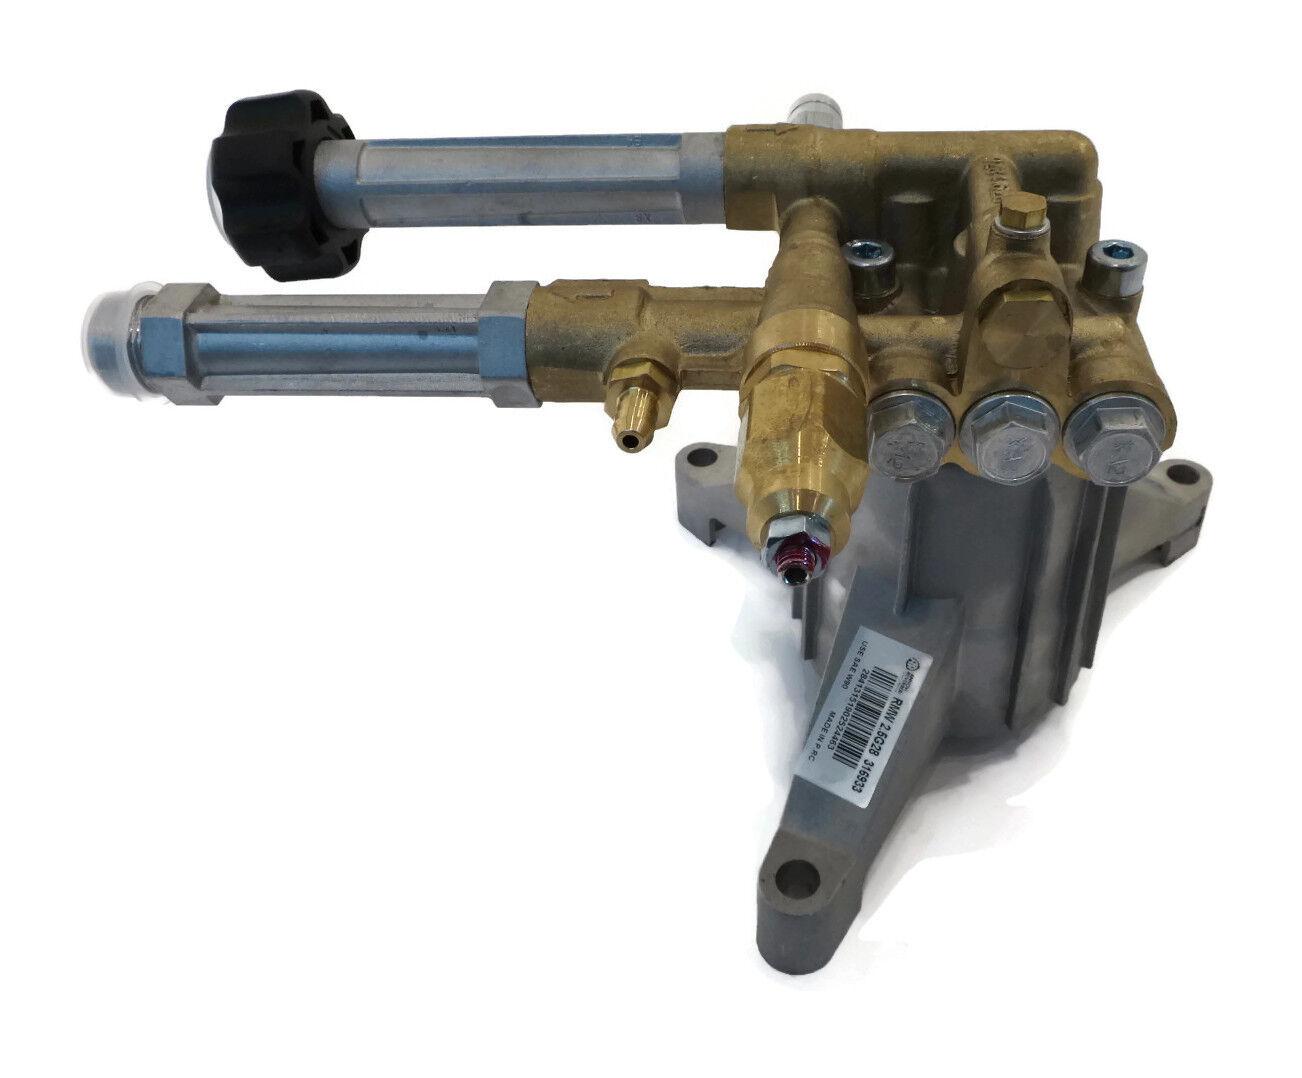 2800 psi POWER PRESSURE WASHER WATER PUMP  Brute  020359-0  020375-0